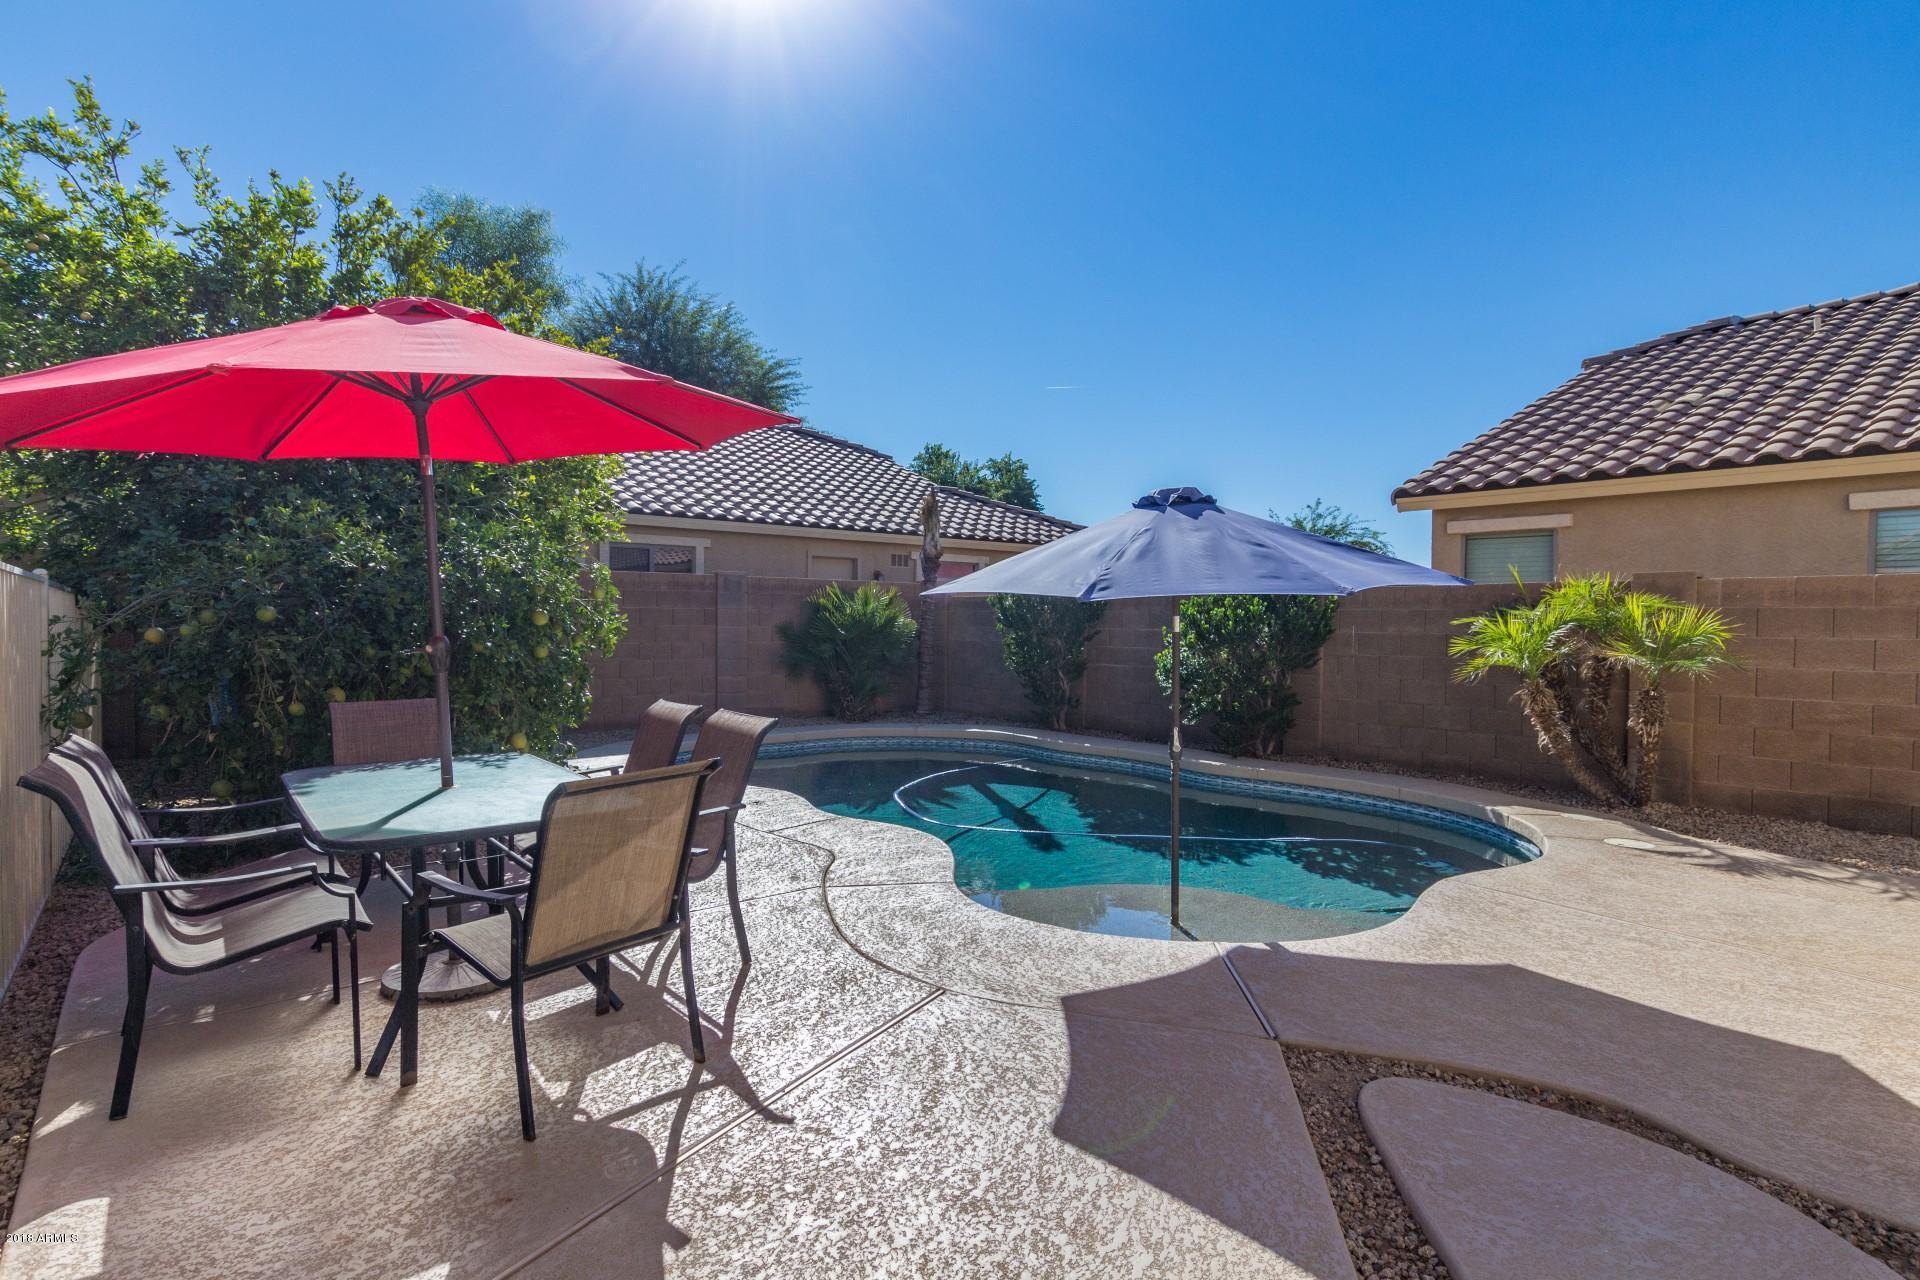 MLS 5847661 23483 S 223RD Court, Queen Creek, AZ 85142 Queen Creek AZ Villages At Queen Creek